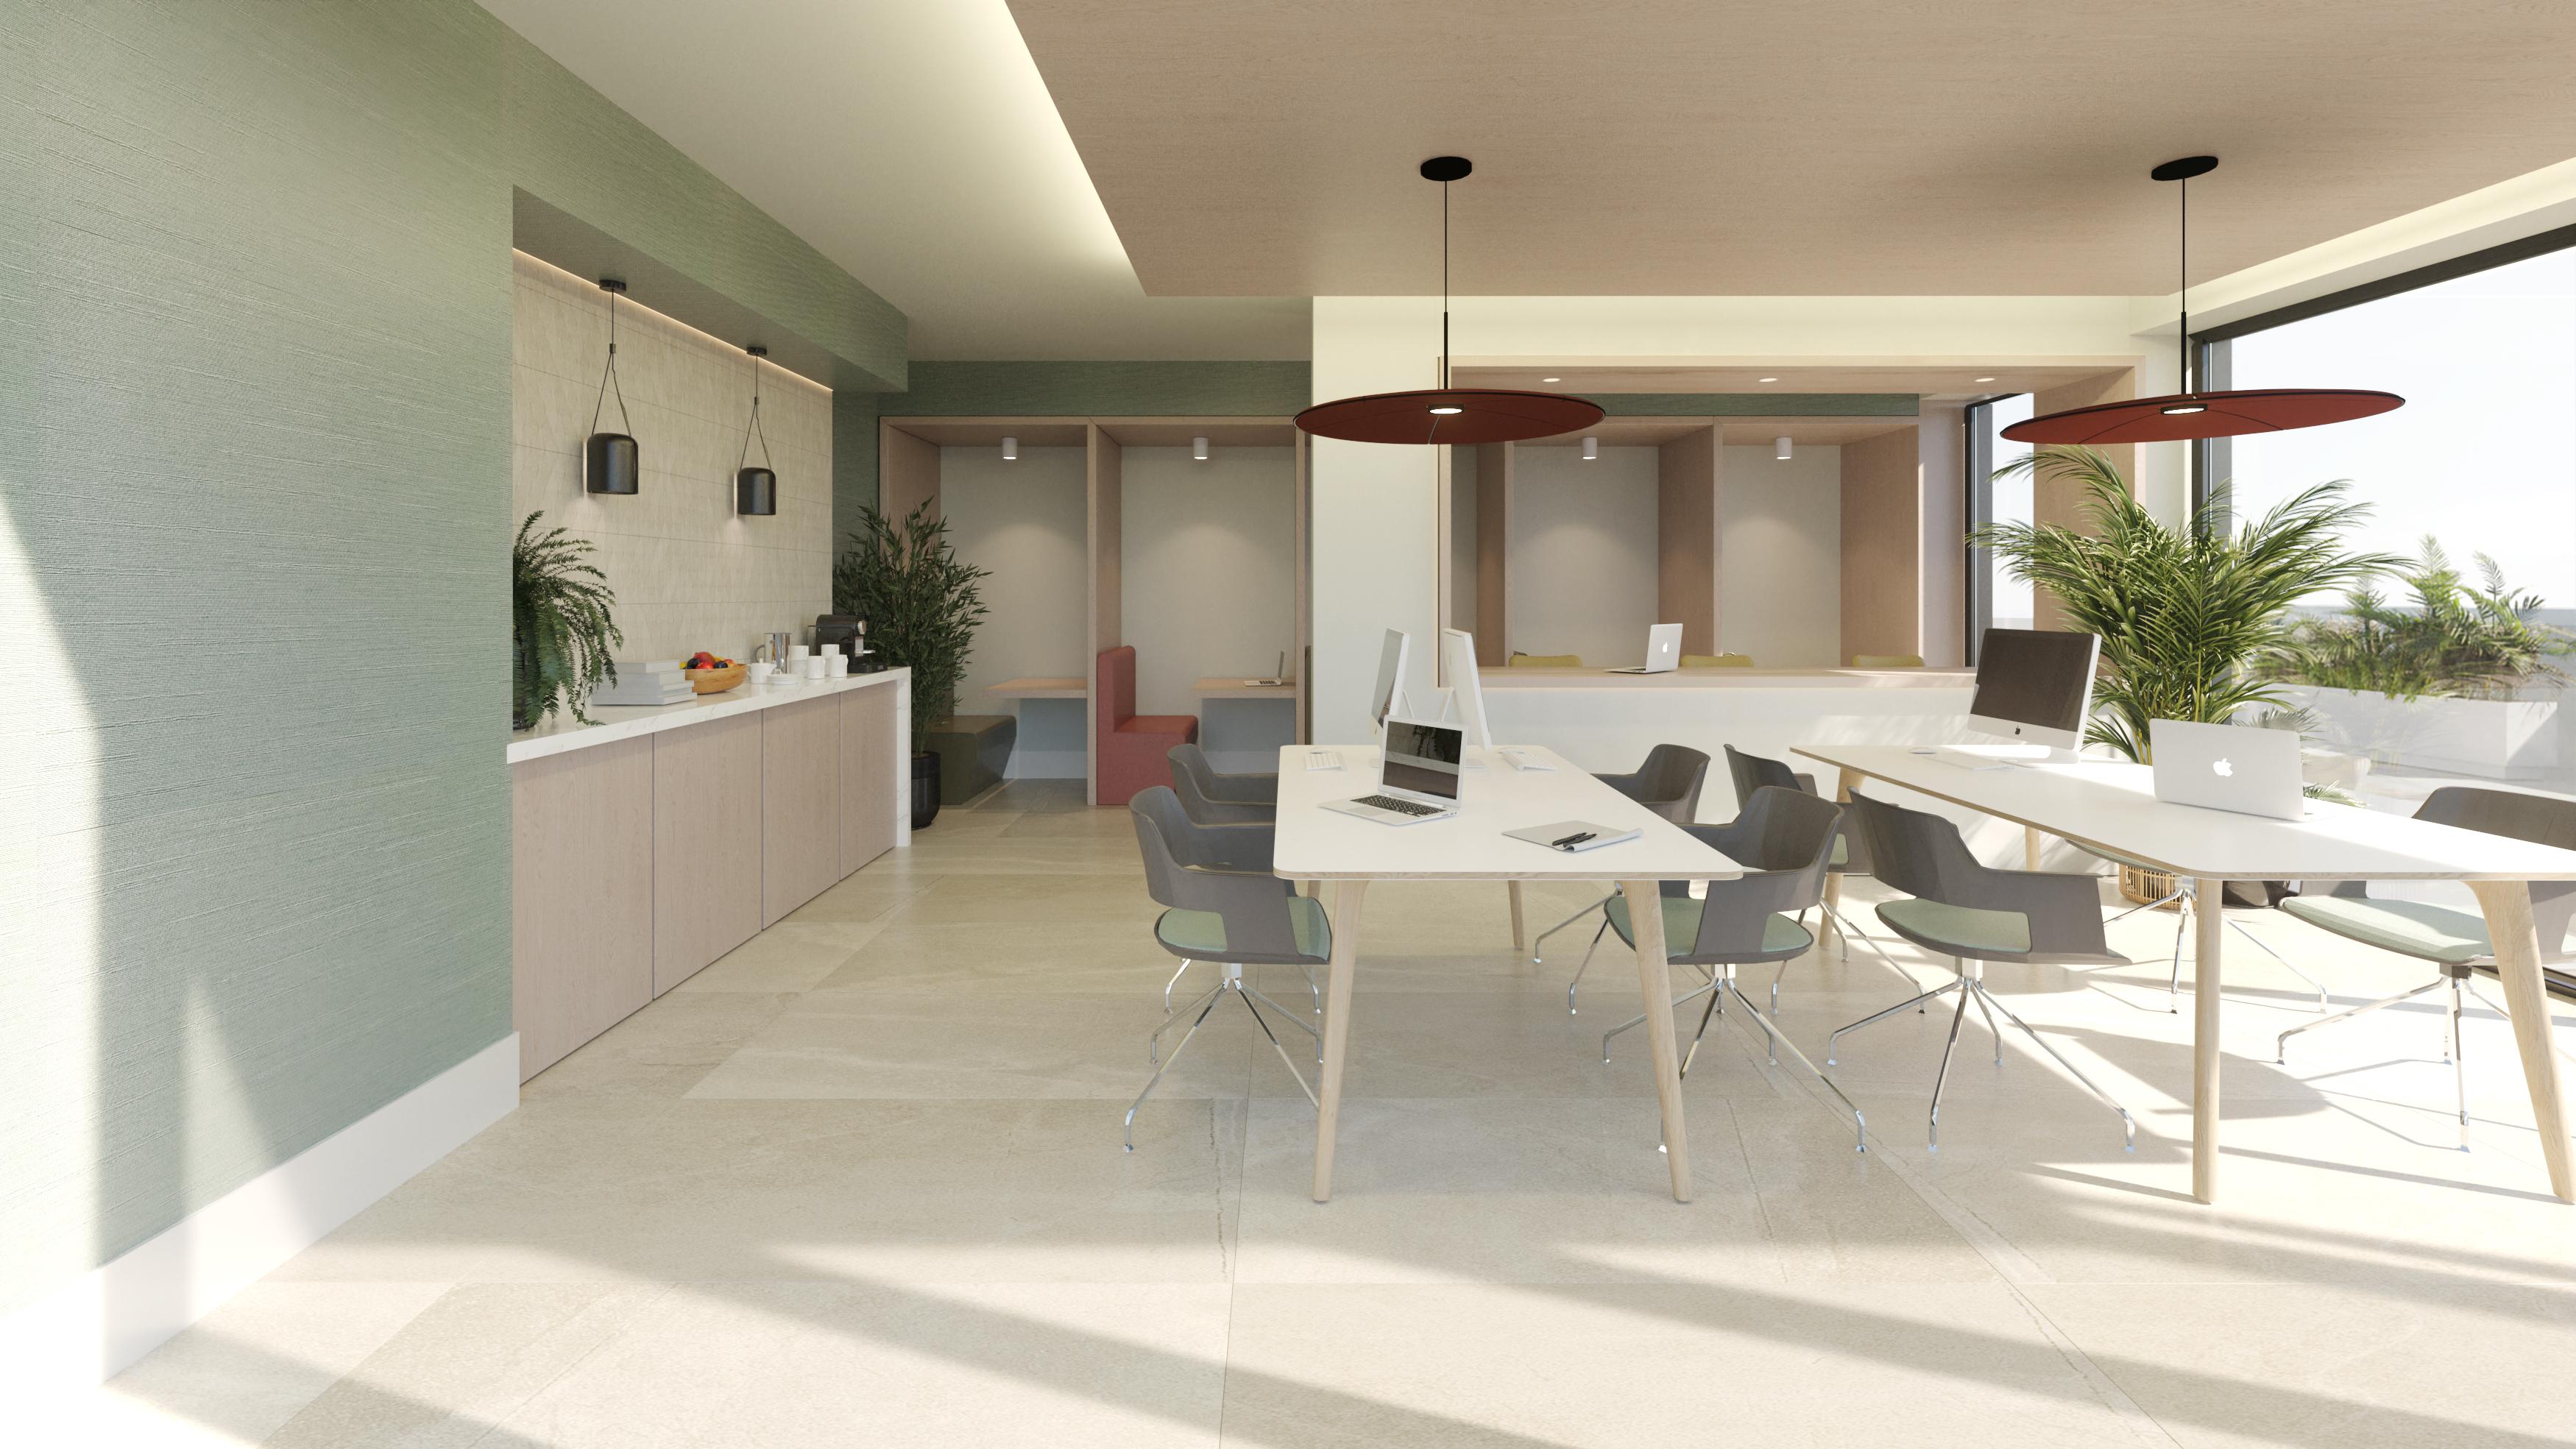 Sala de coworking / Levitt